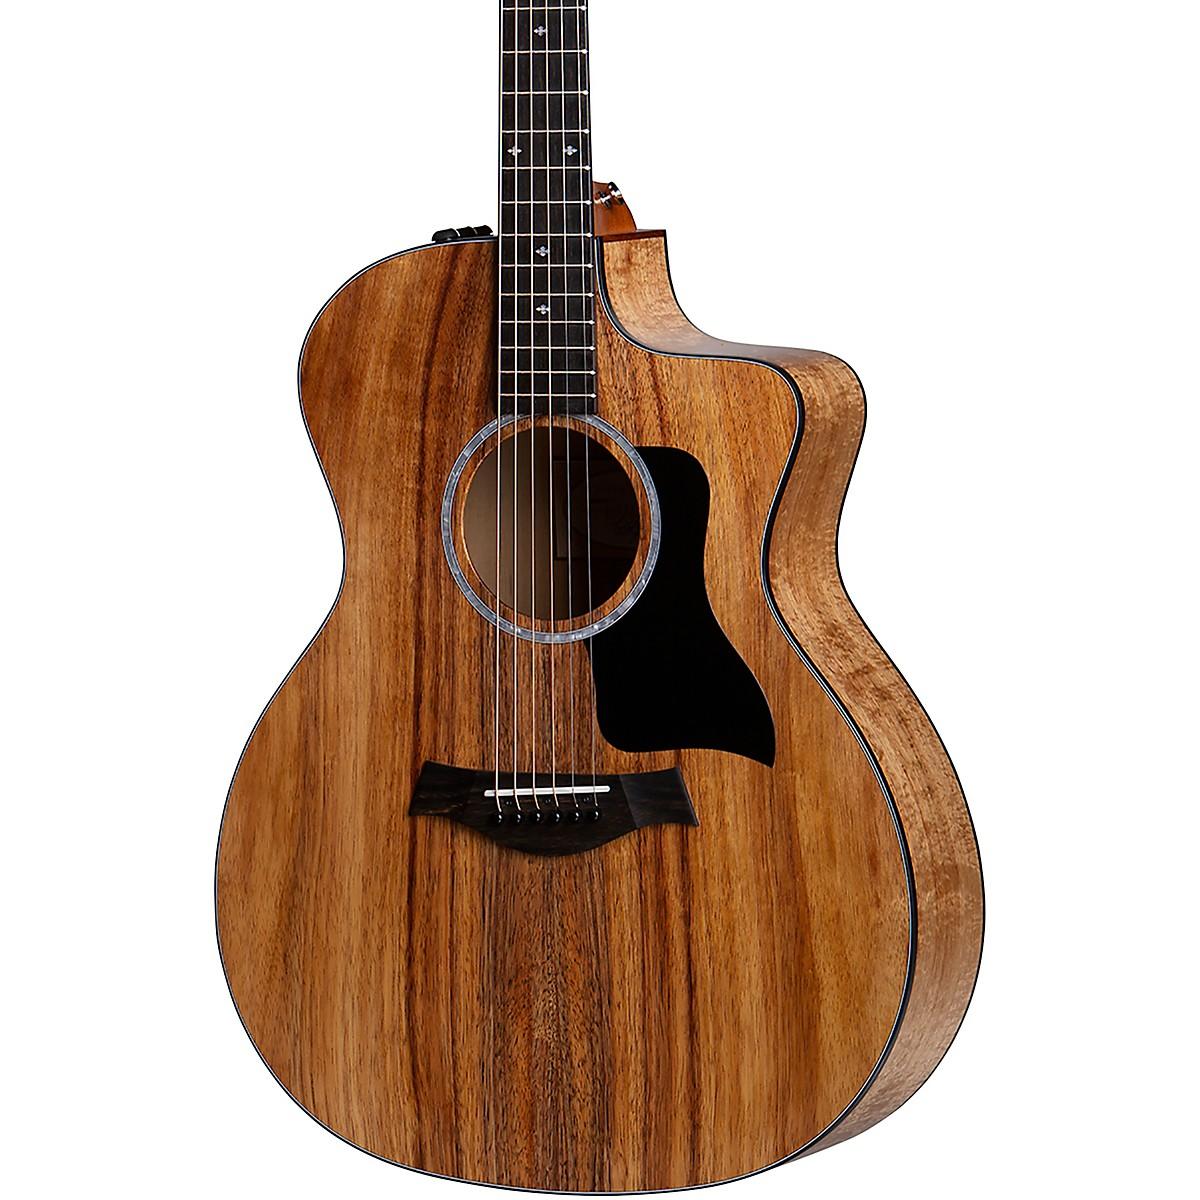 Taylor 224ce-K DLX Special Edition Grand Auditorium Acoustic-Electric Guitar